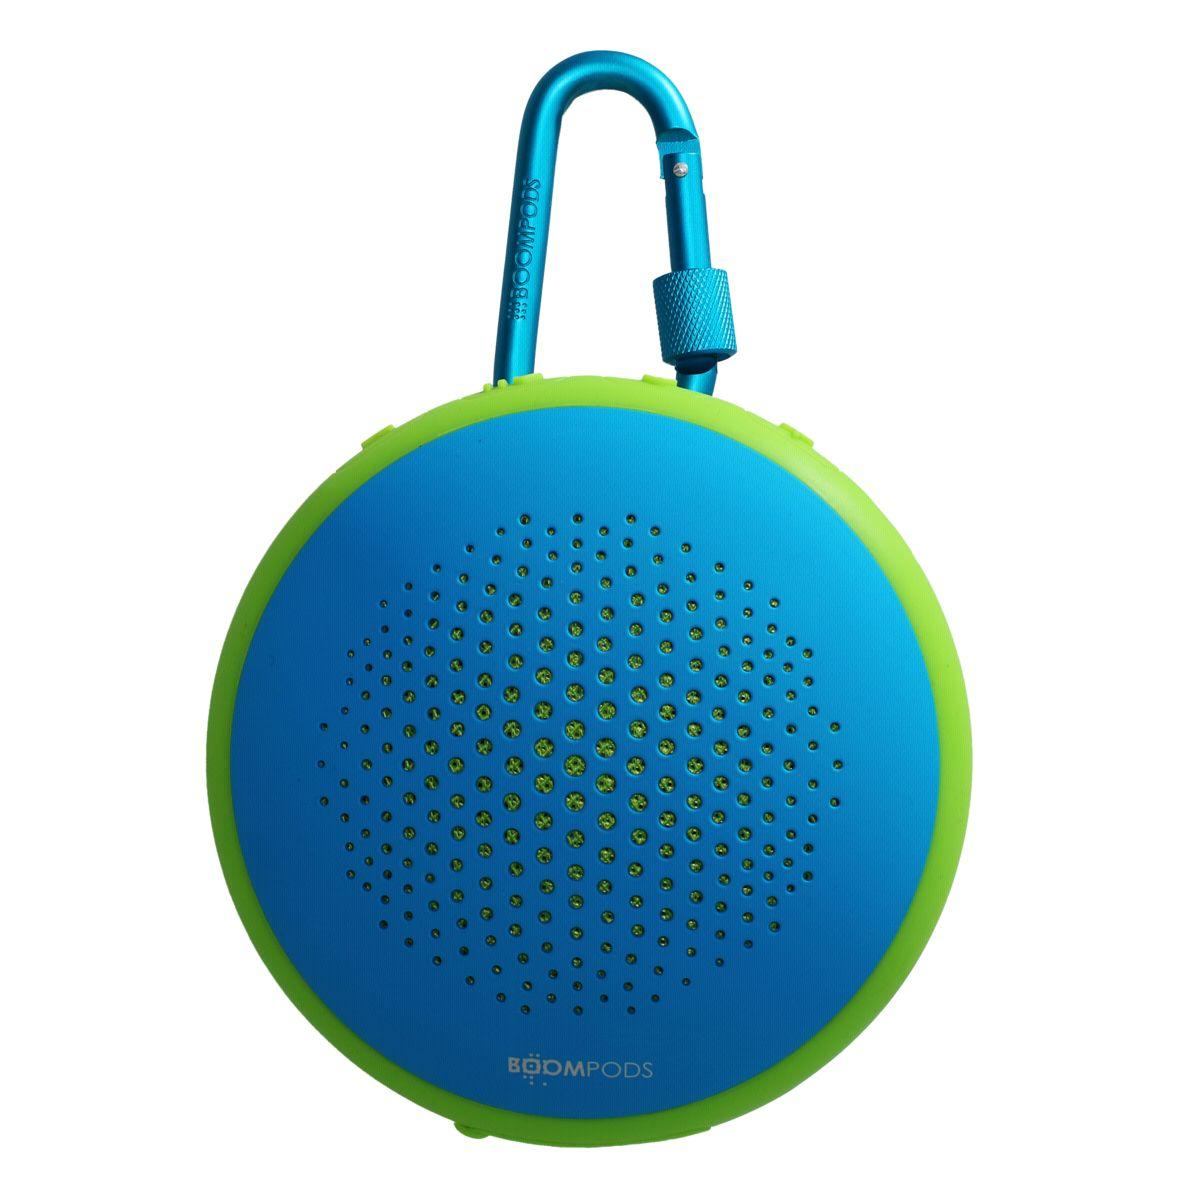 Aktuelle Angebote Kaufroboter Die Discounter Suchmaschine Basic Ear Bud Earphone Eb 12 Hitam Boompods Lautsprecher Fusion